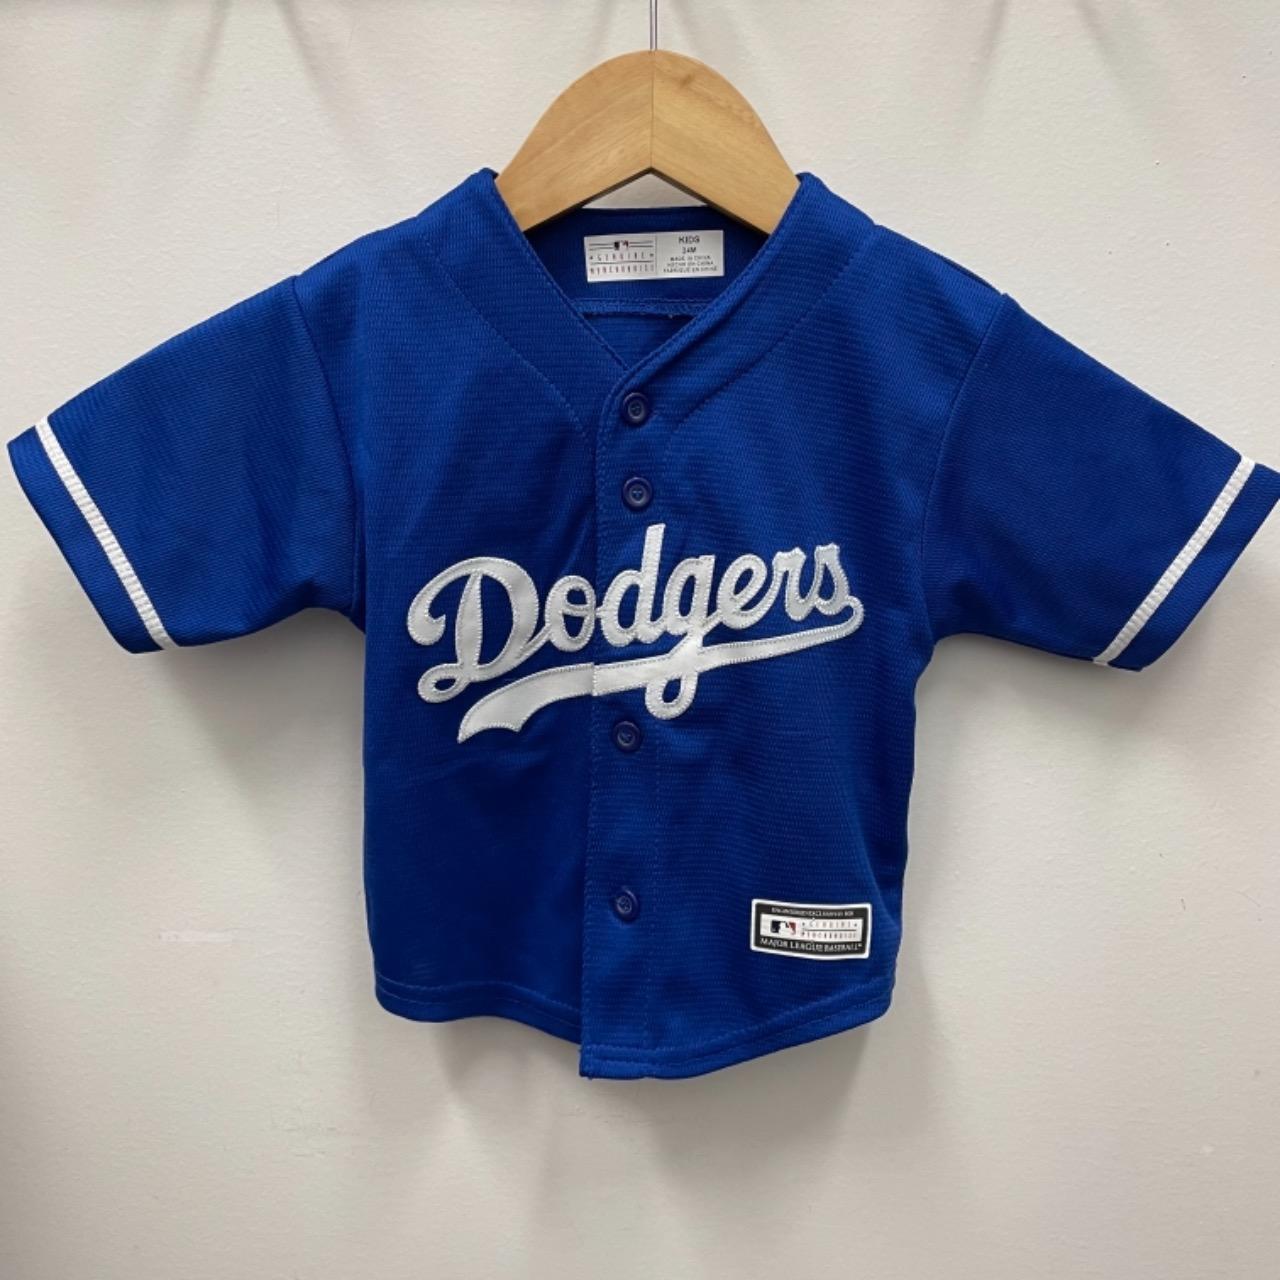 Majestic Kids Dodgers MLB Shirt Size 2 Blue/White